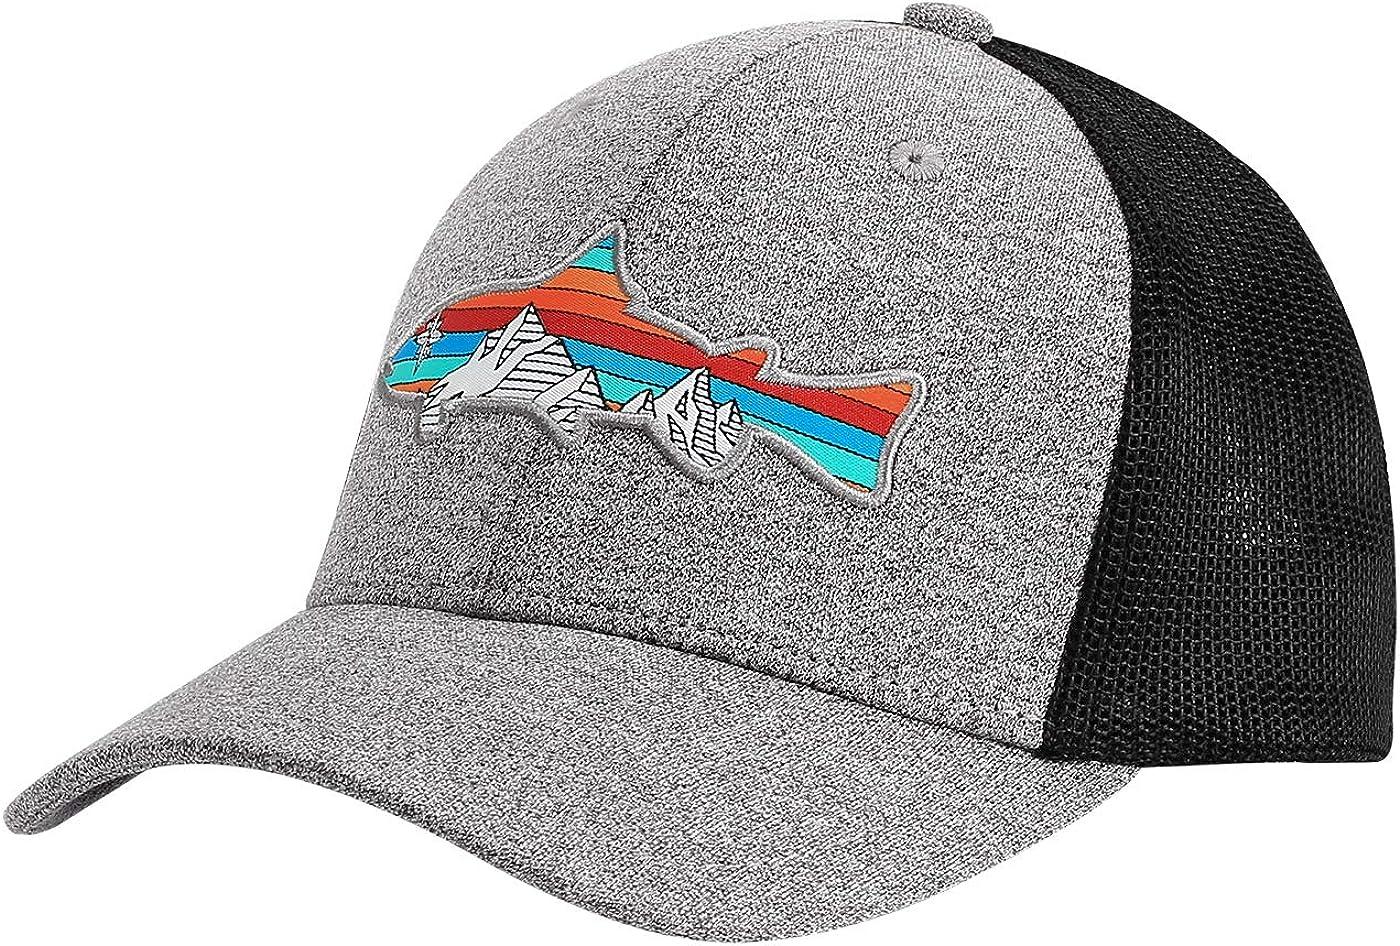 HDE Men Fishing Hats Trucker Ranking TOP4 Hat Fit Fitted Mesh Flexible Baseba Max 60% OFF